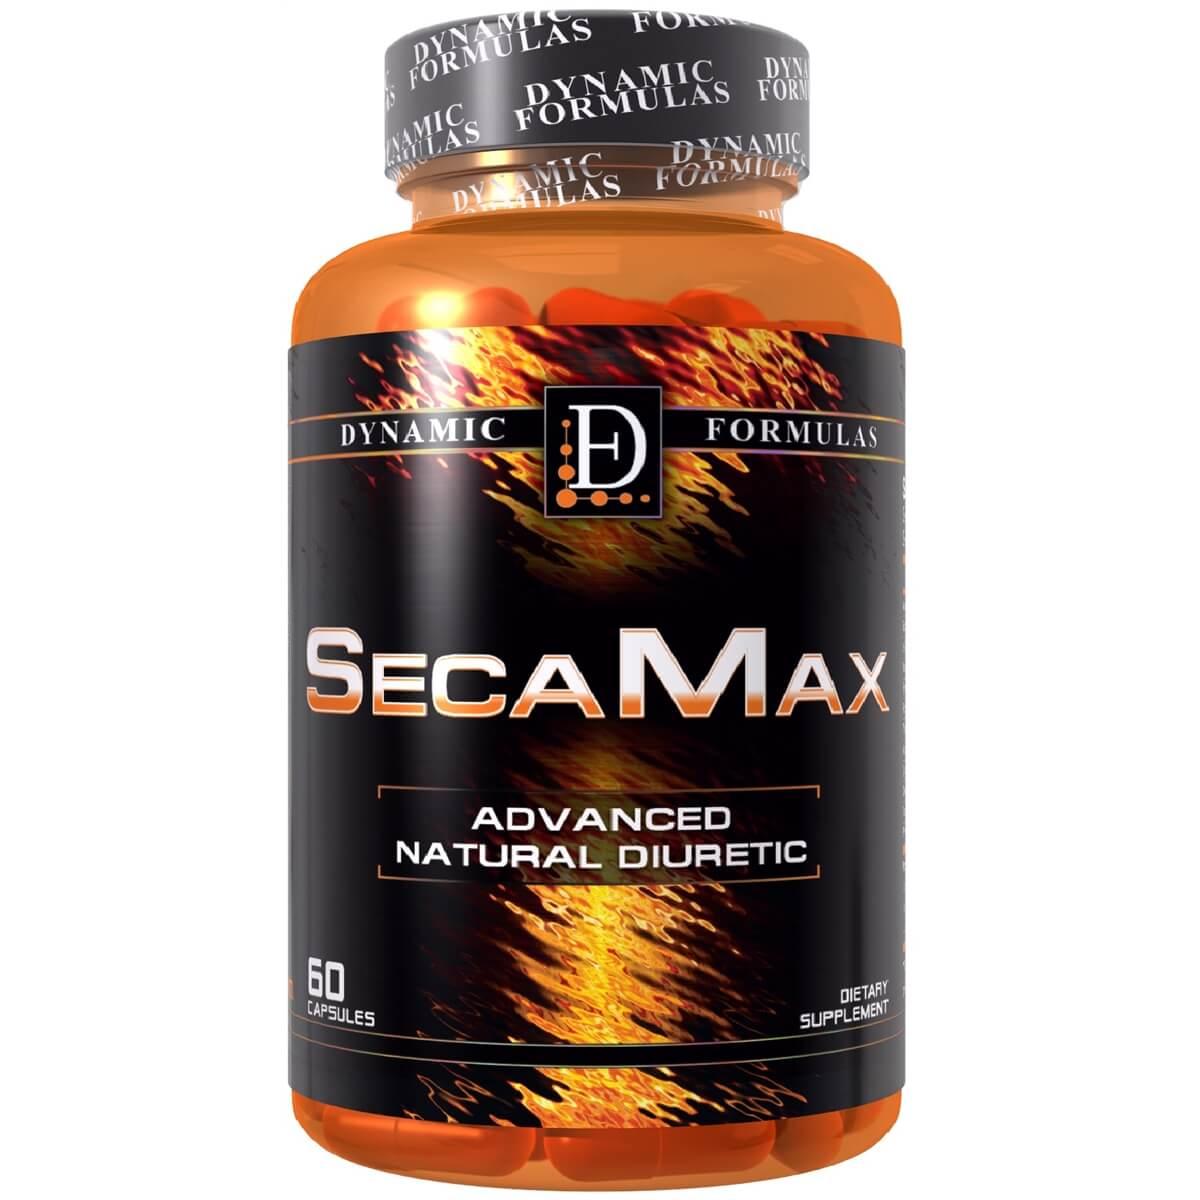 Seca Max Dynamic Formulas - 60 caps